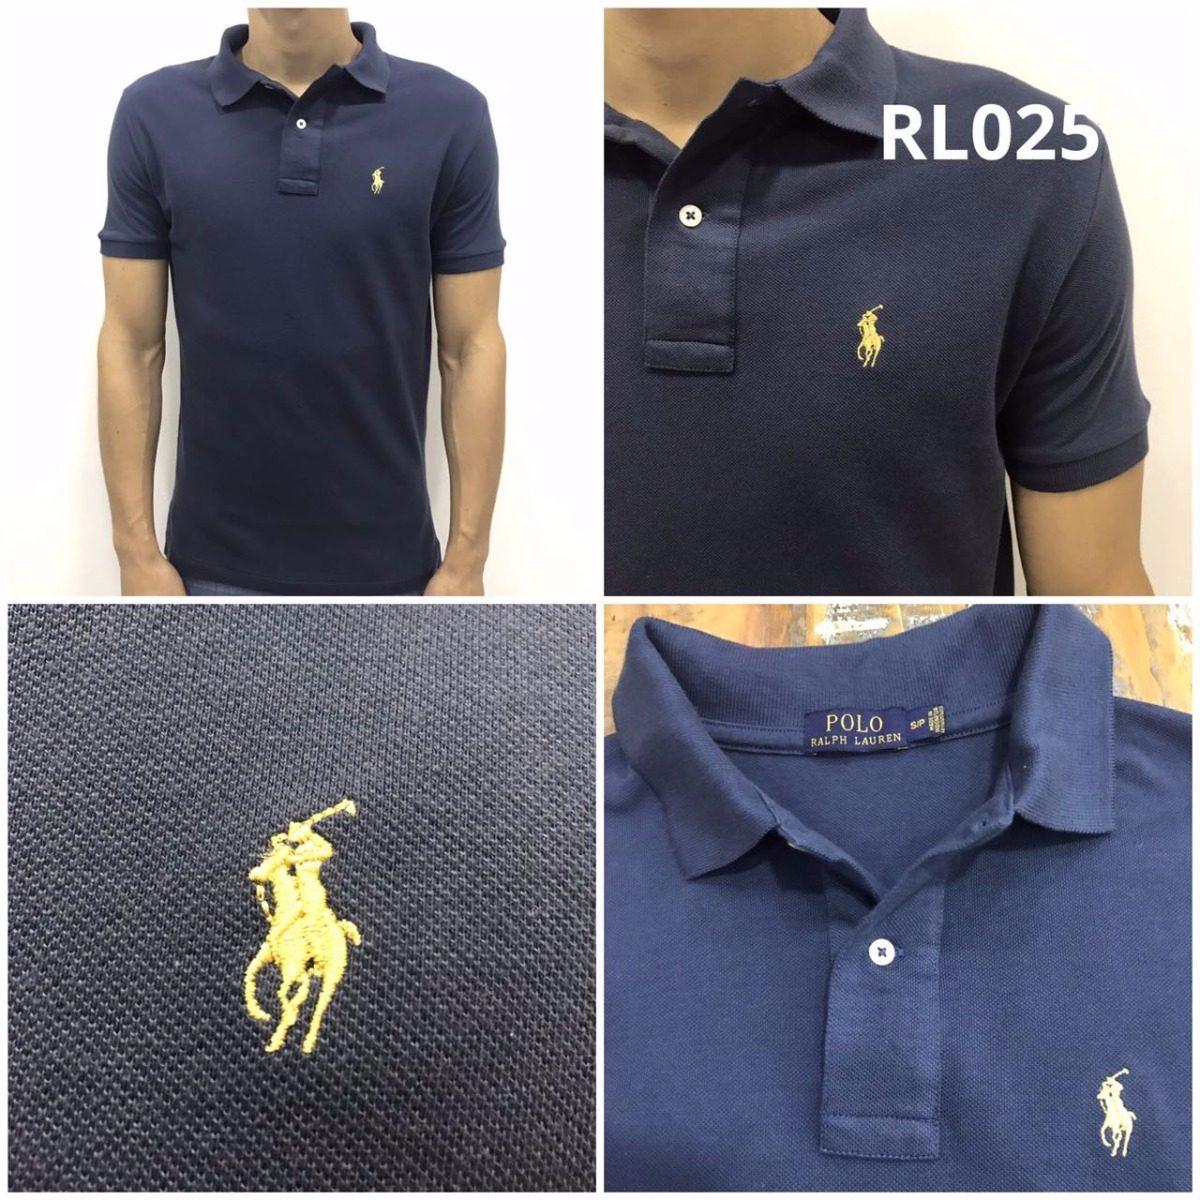 ... d6de3cc18c2 camiseta polo ralph lauren azul marinho original top frete.  Carregando zoom. f777202f25c3c